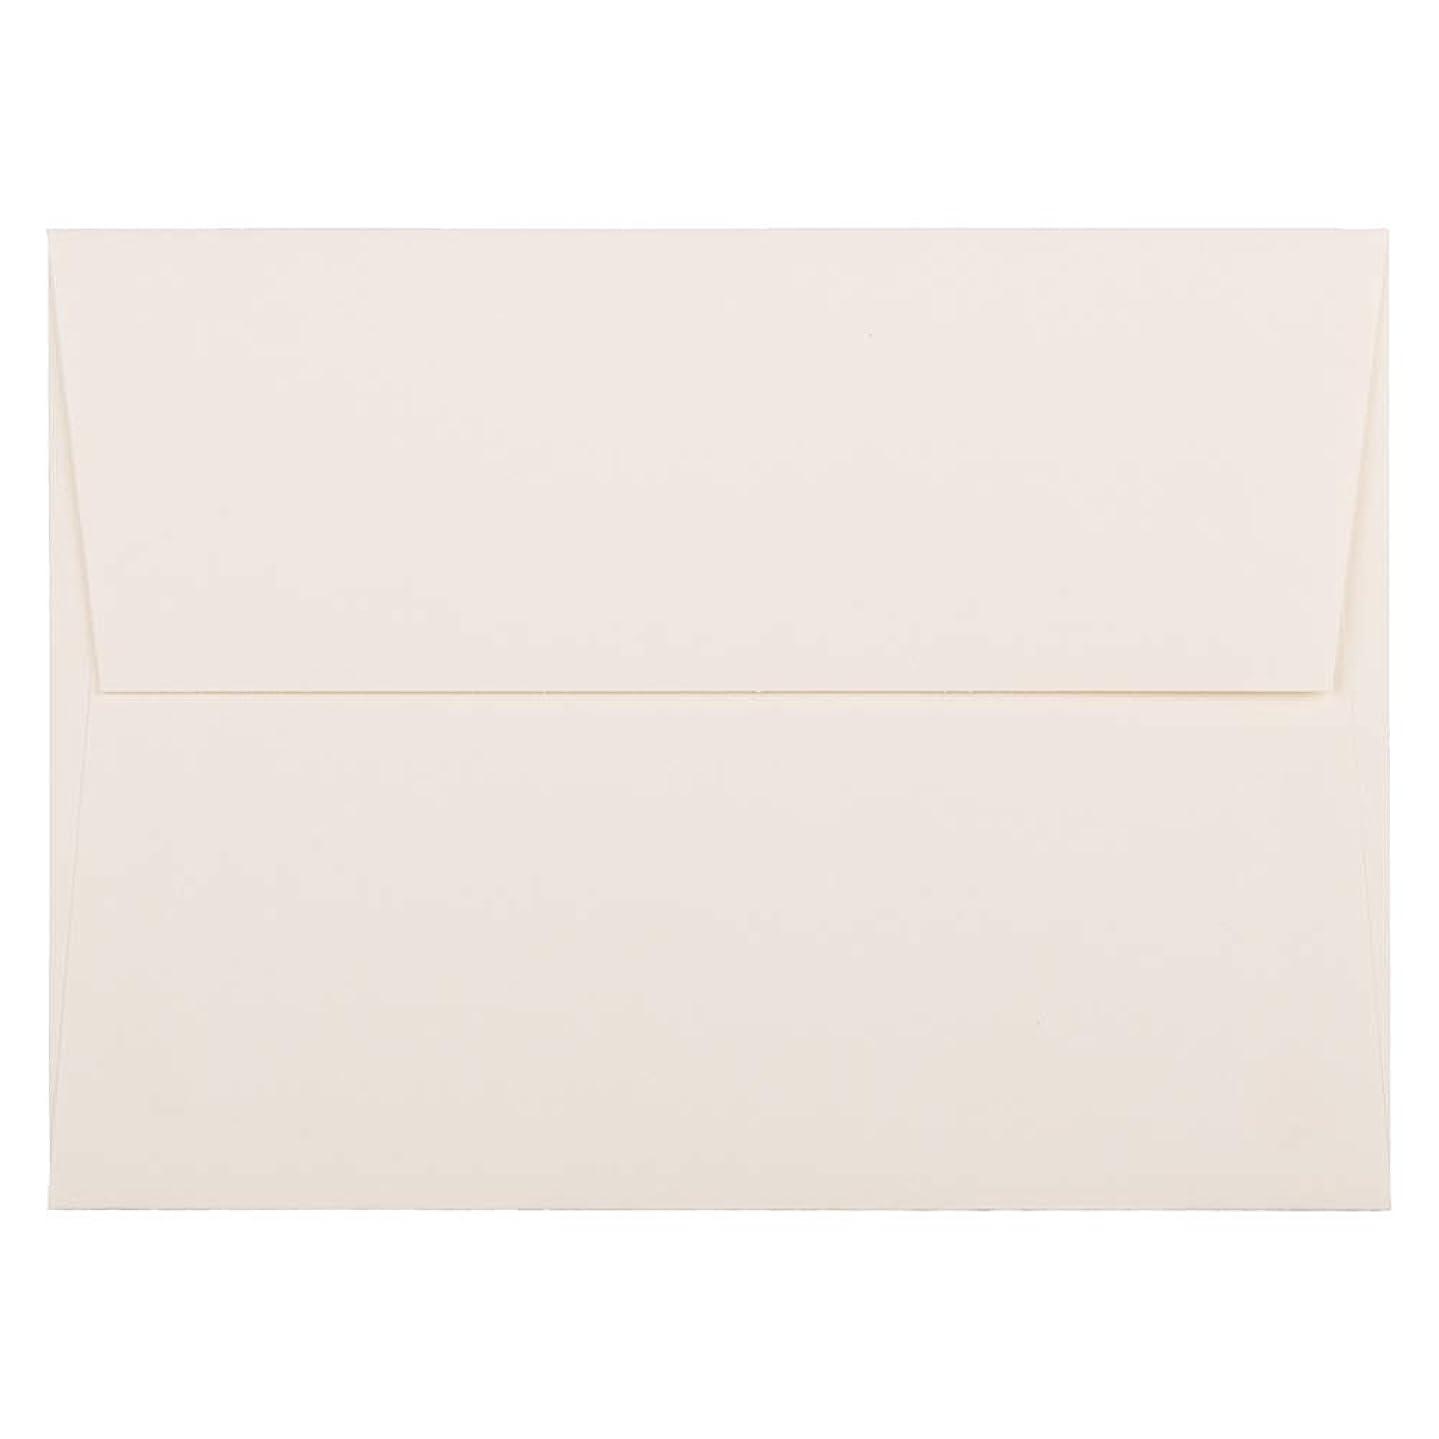 JAM PAPER A7 Strathmore Invitation Envelopes - 5 1/4 x 7 1/4 - Natural White Wove - 50/Pack